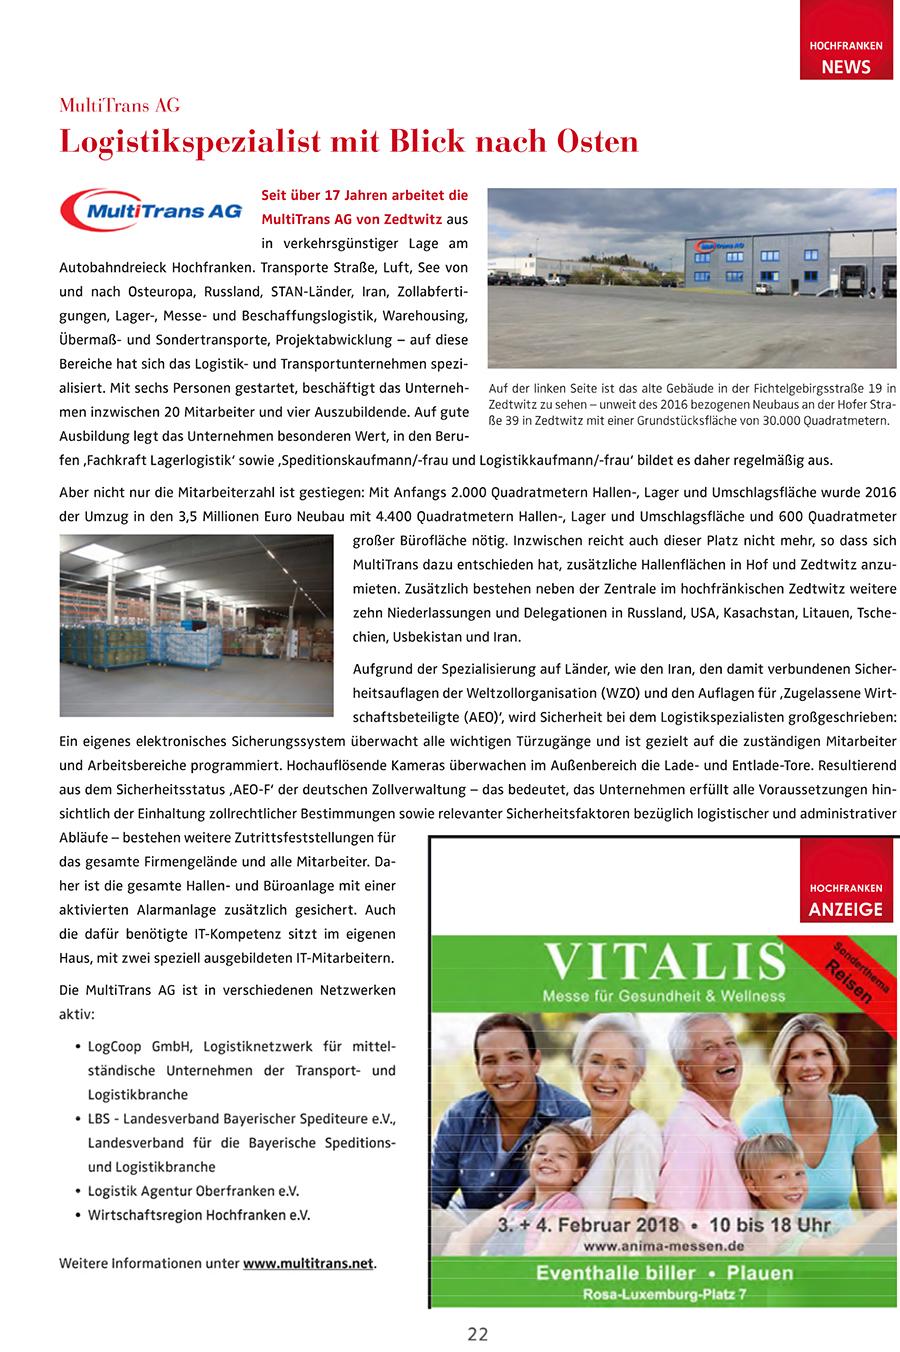 Hochfranken News